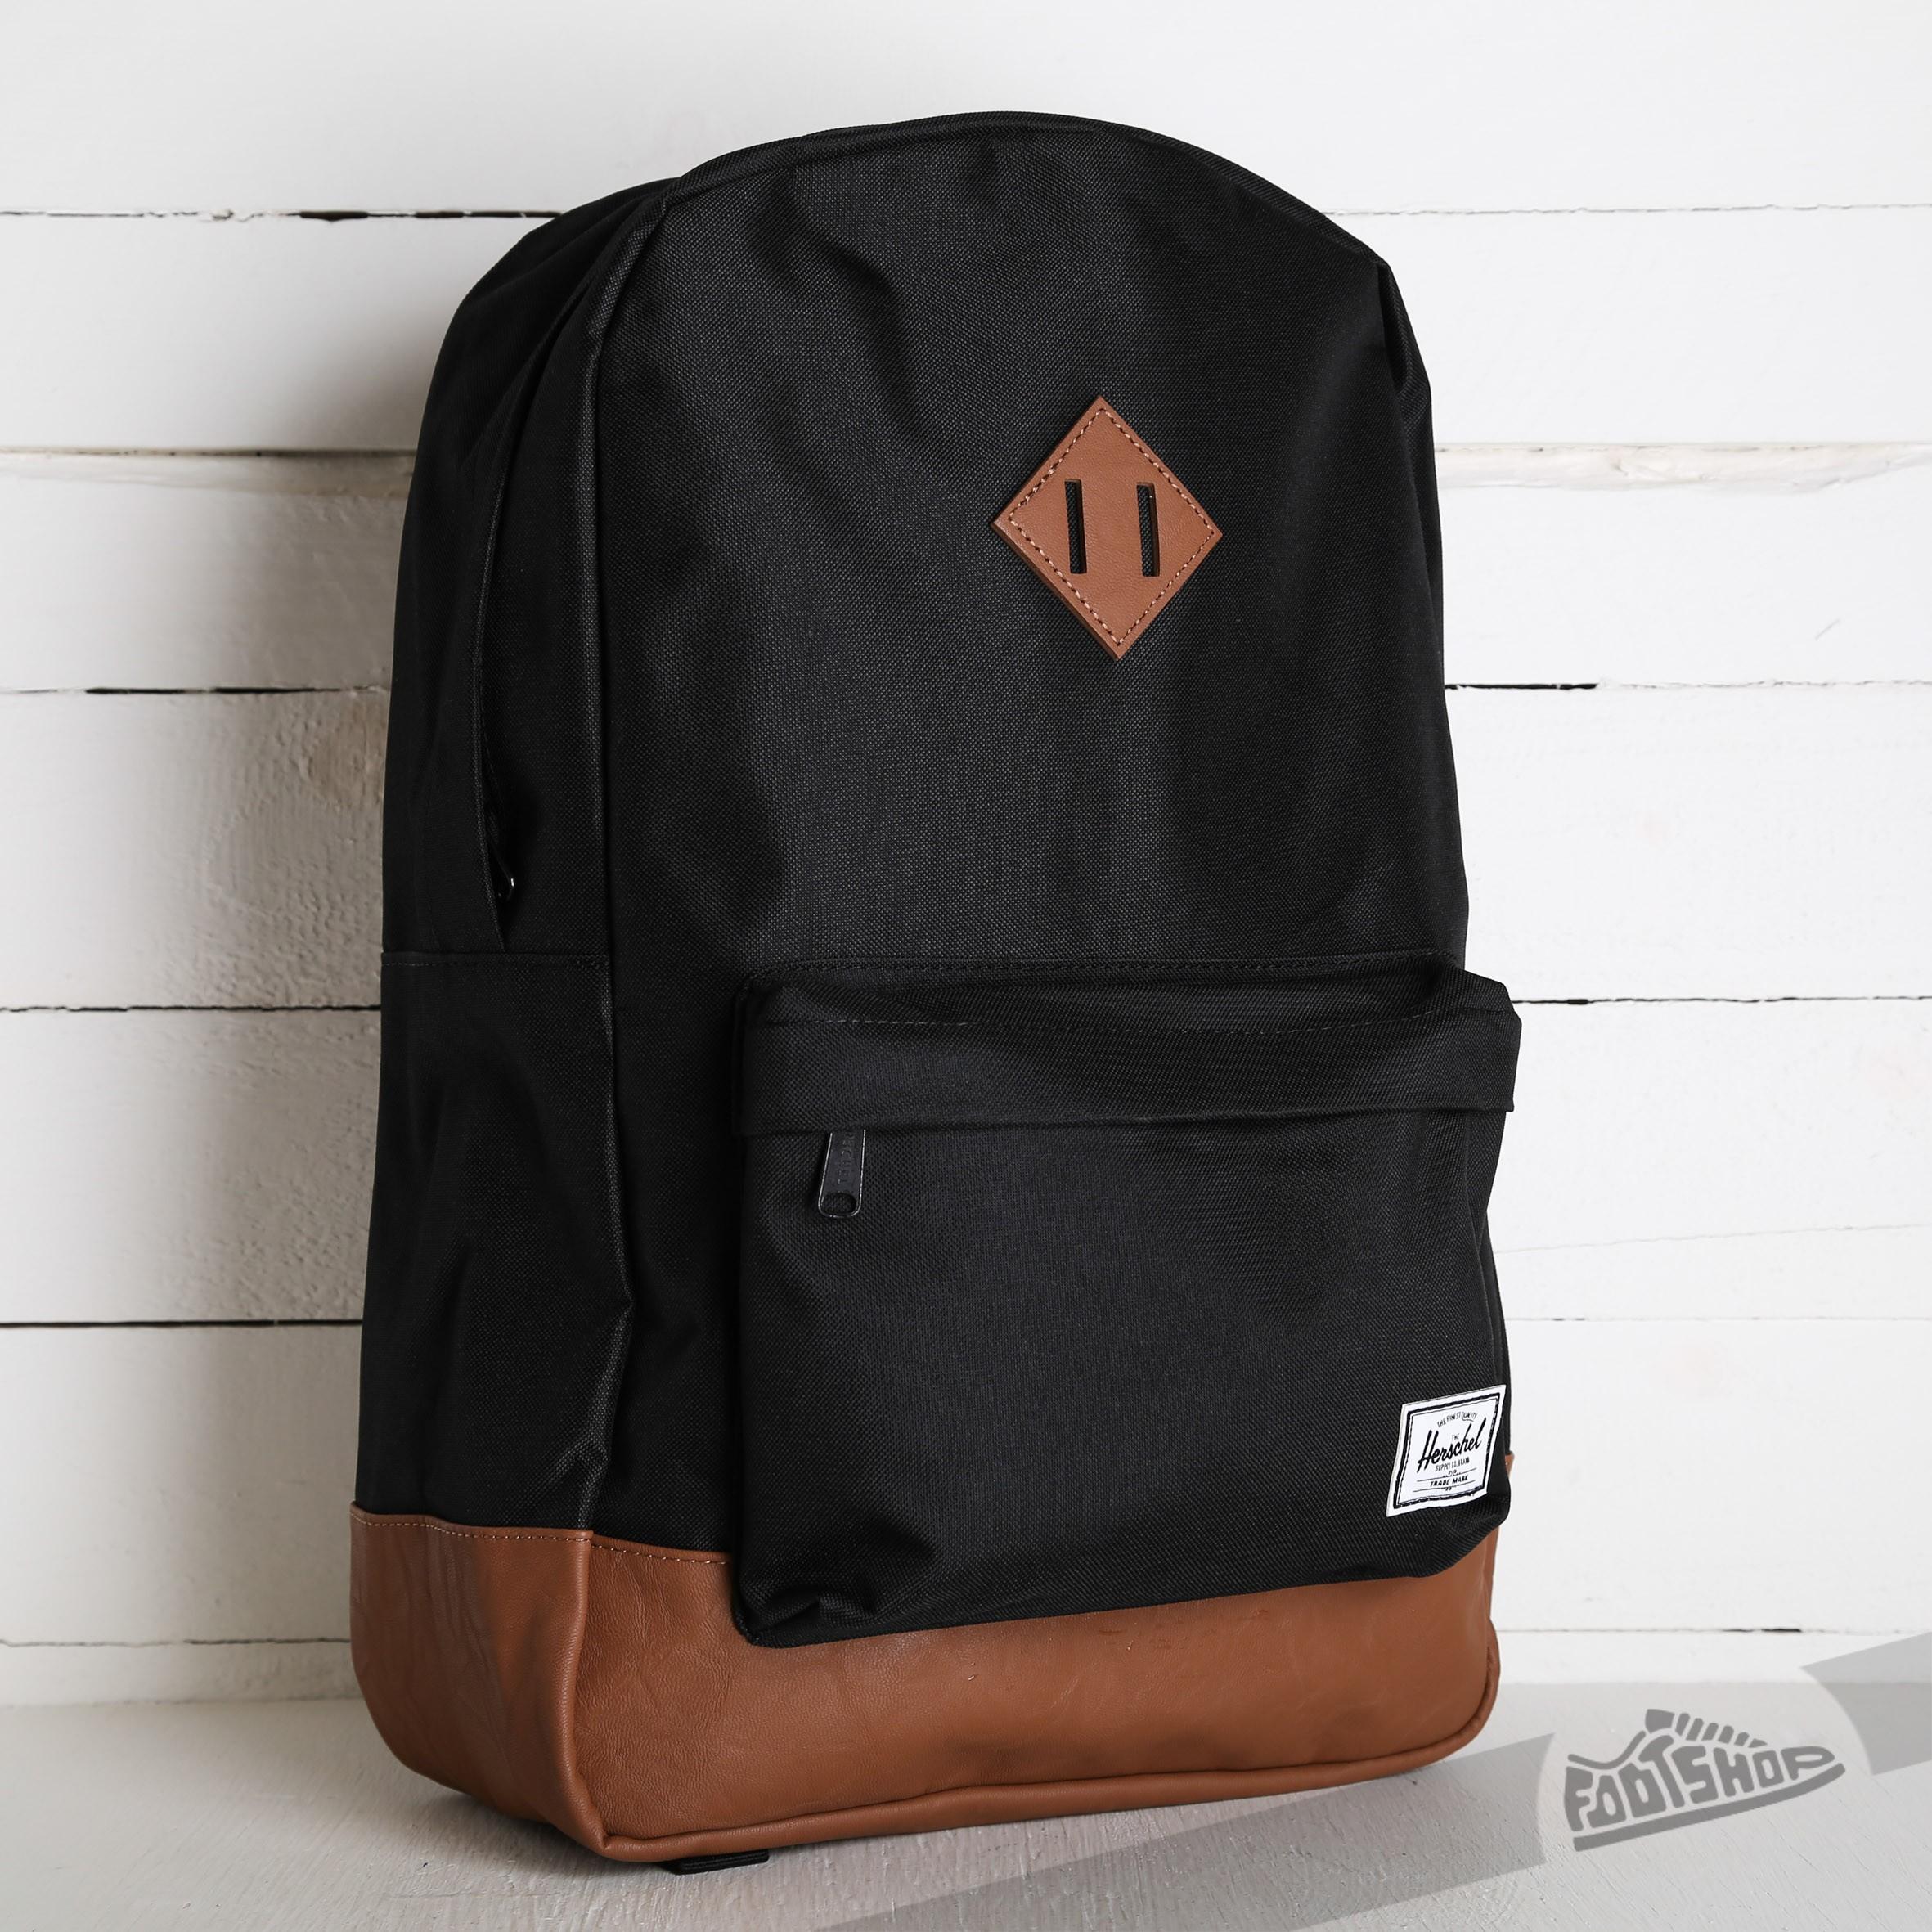 906266d8e6 Herschel Supply Co. Heritage Backpack Black Tan